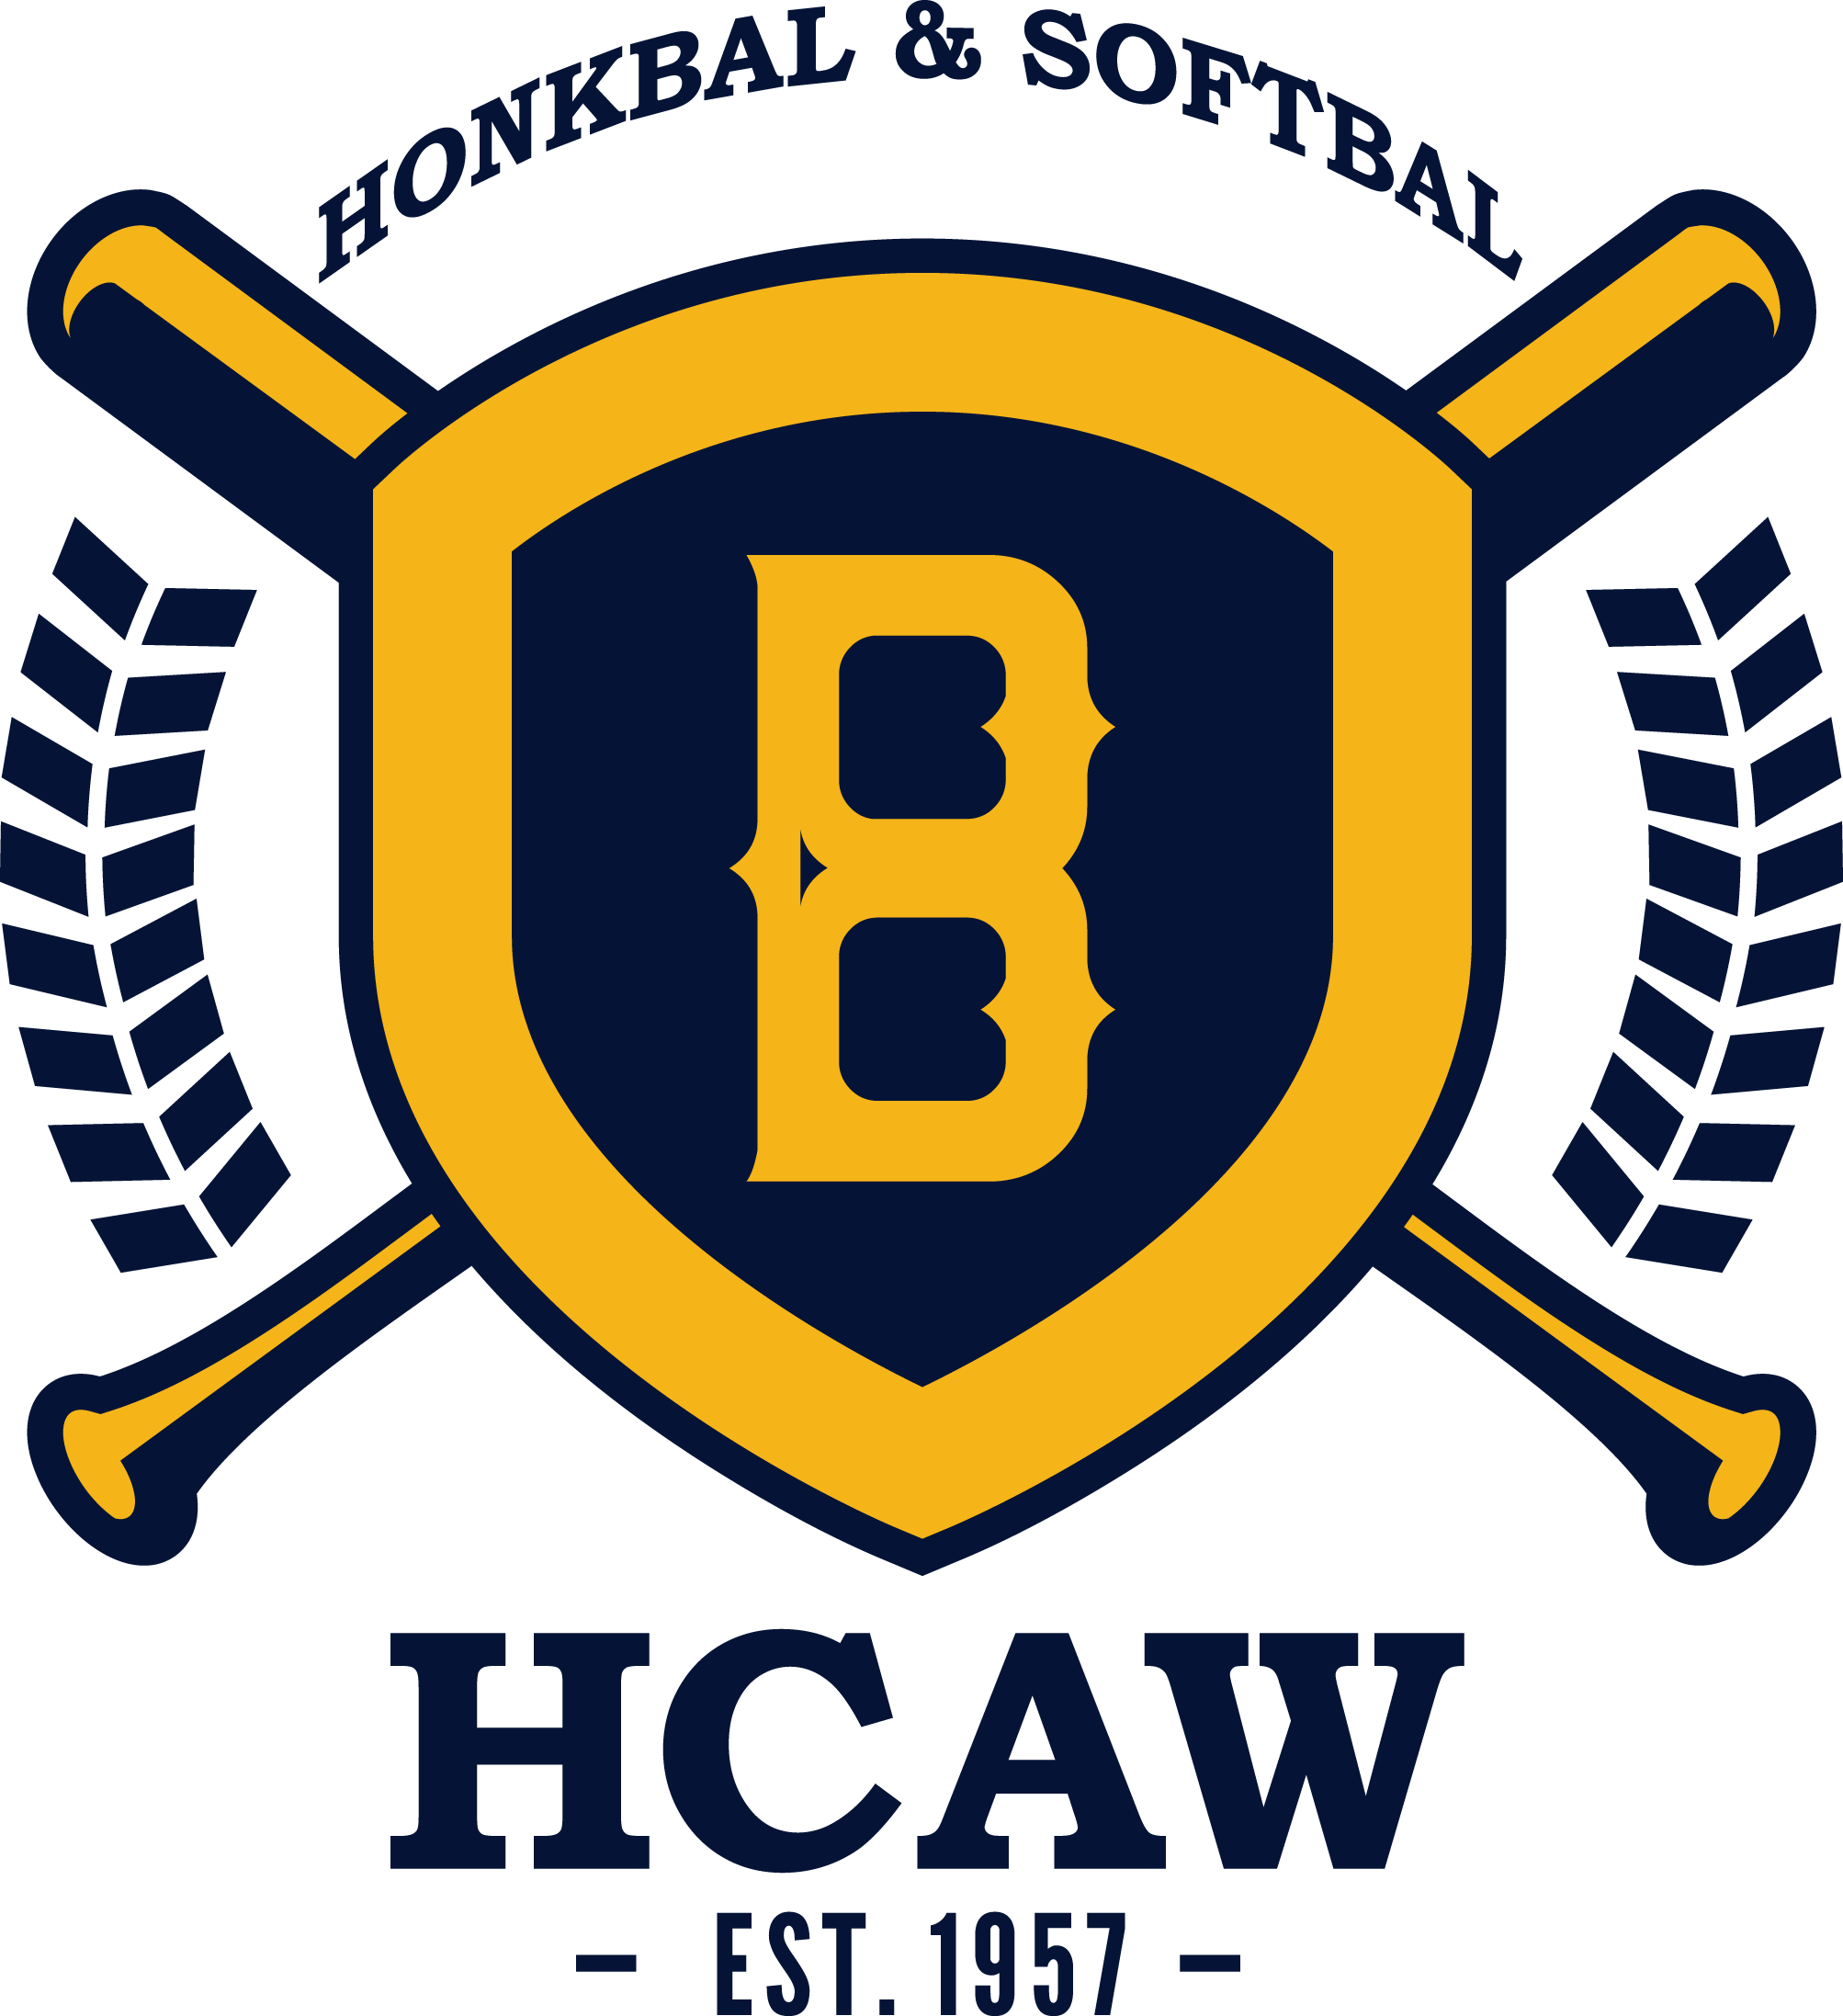 HCAW-logo-transparant